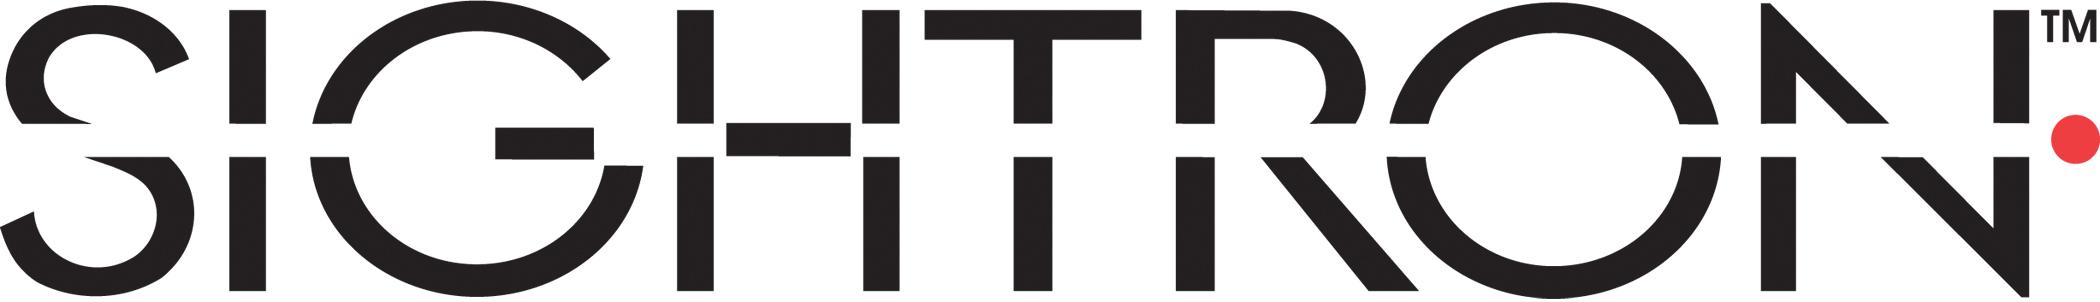 sightron-logo.jpg